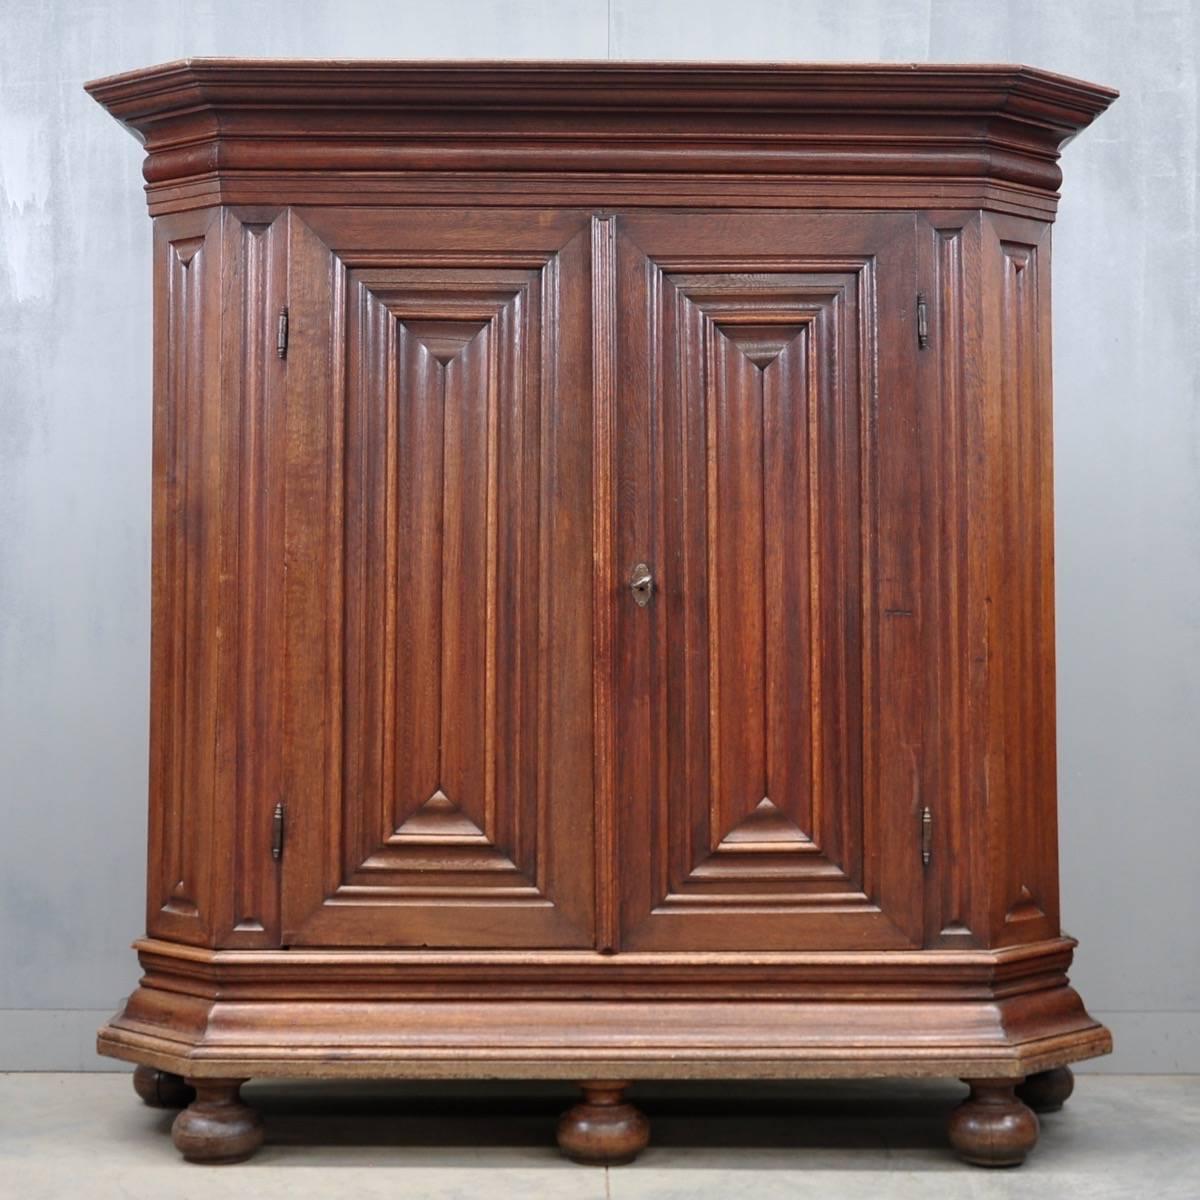 armoire furniture antique. Antique German Oak Armoire Furniture B